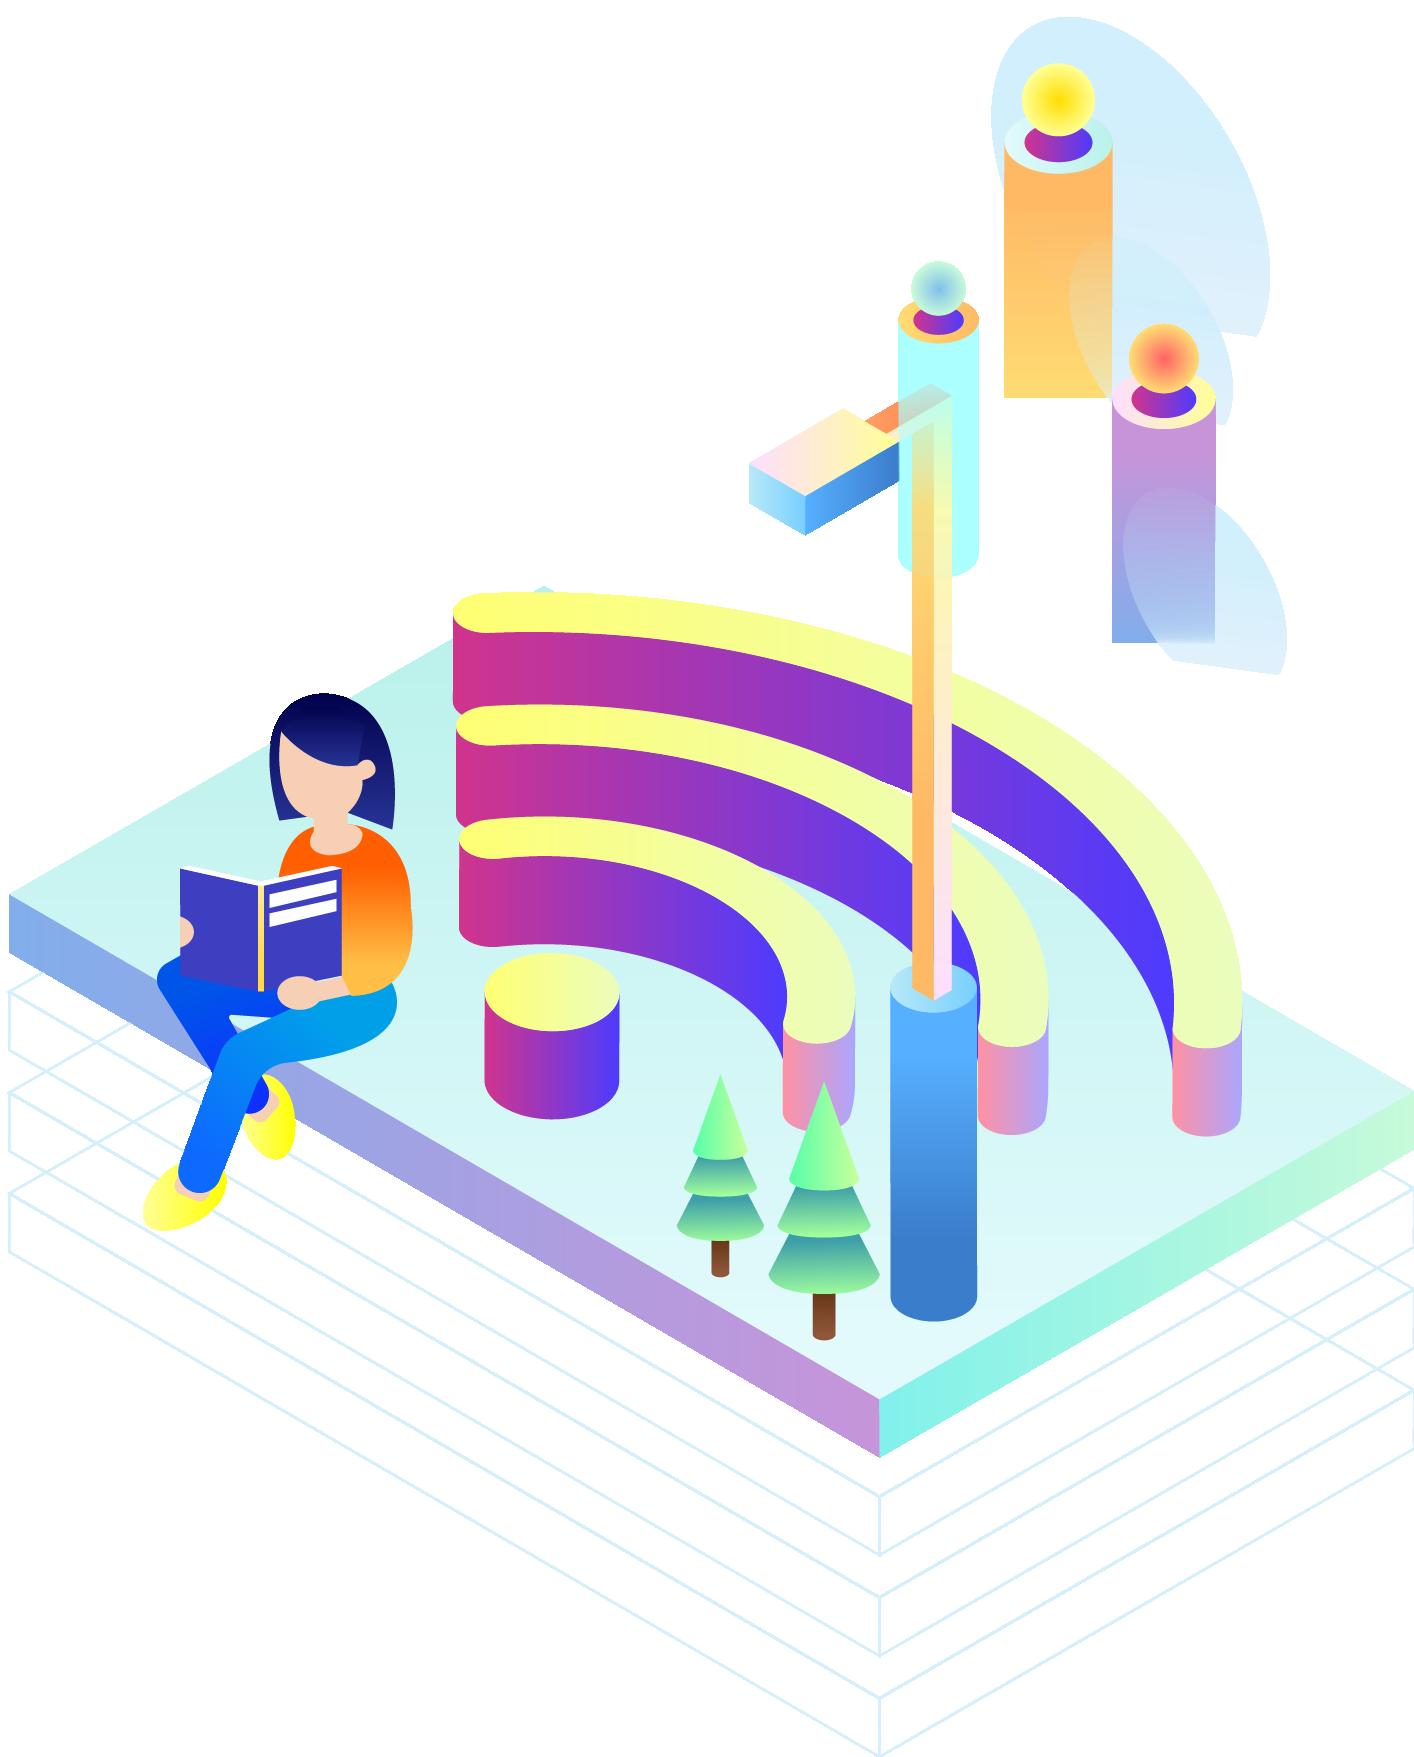 télécommunications wifi 6 cdx télécom